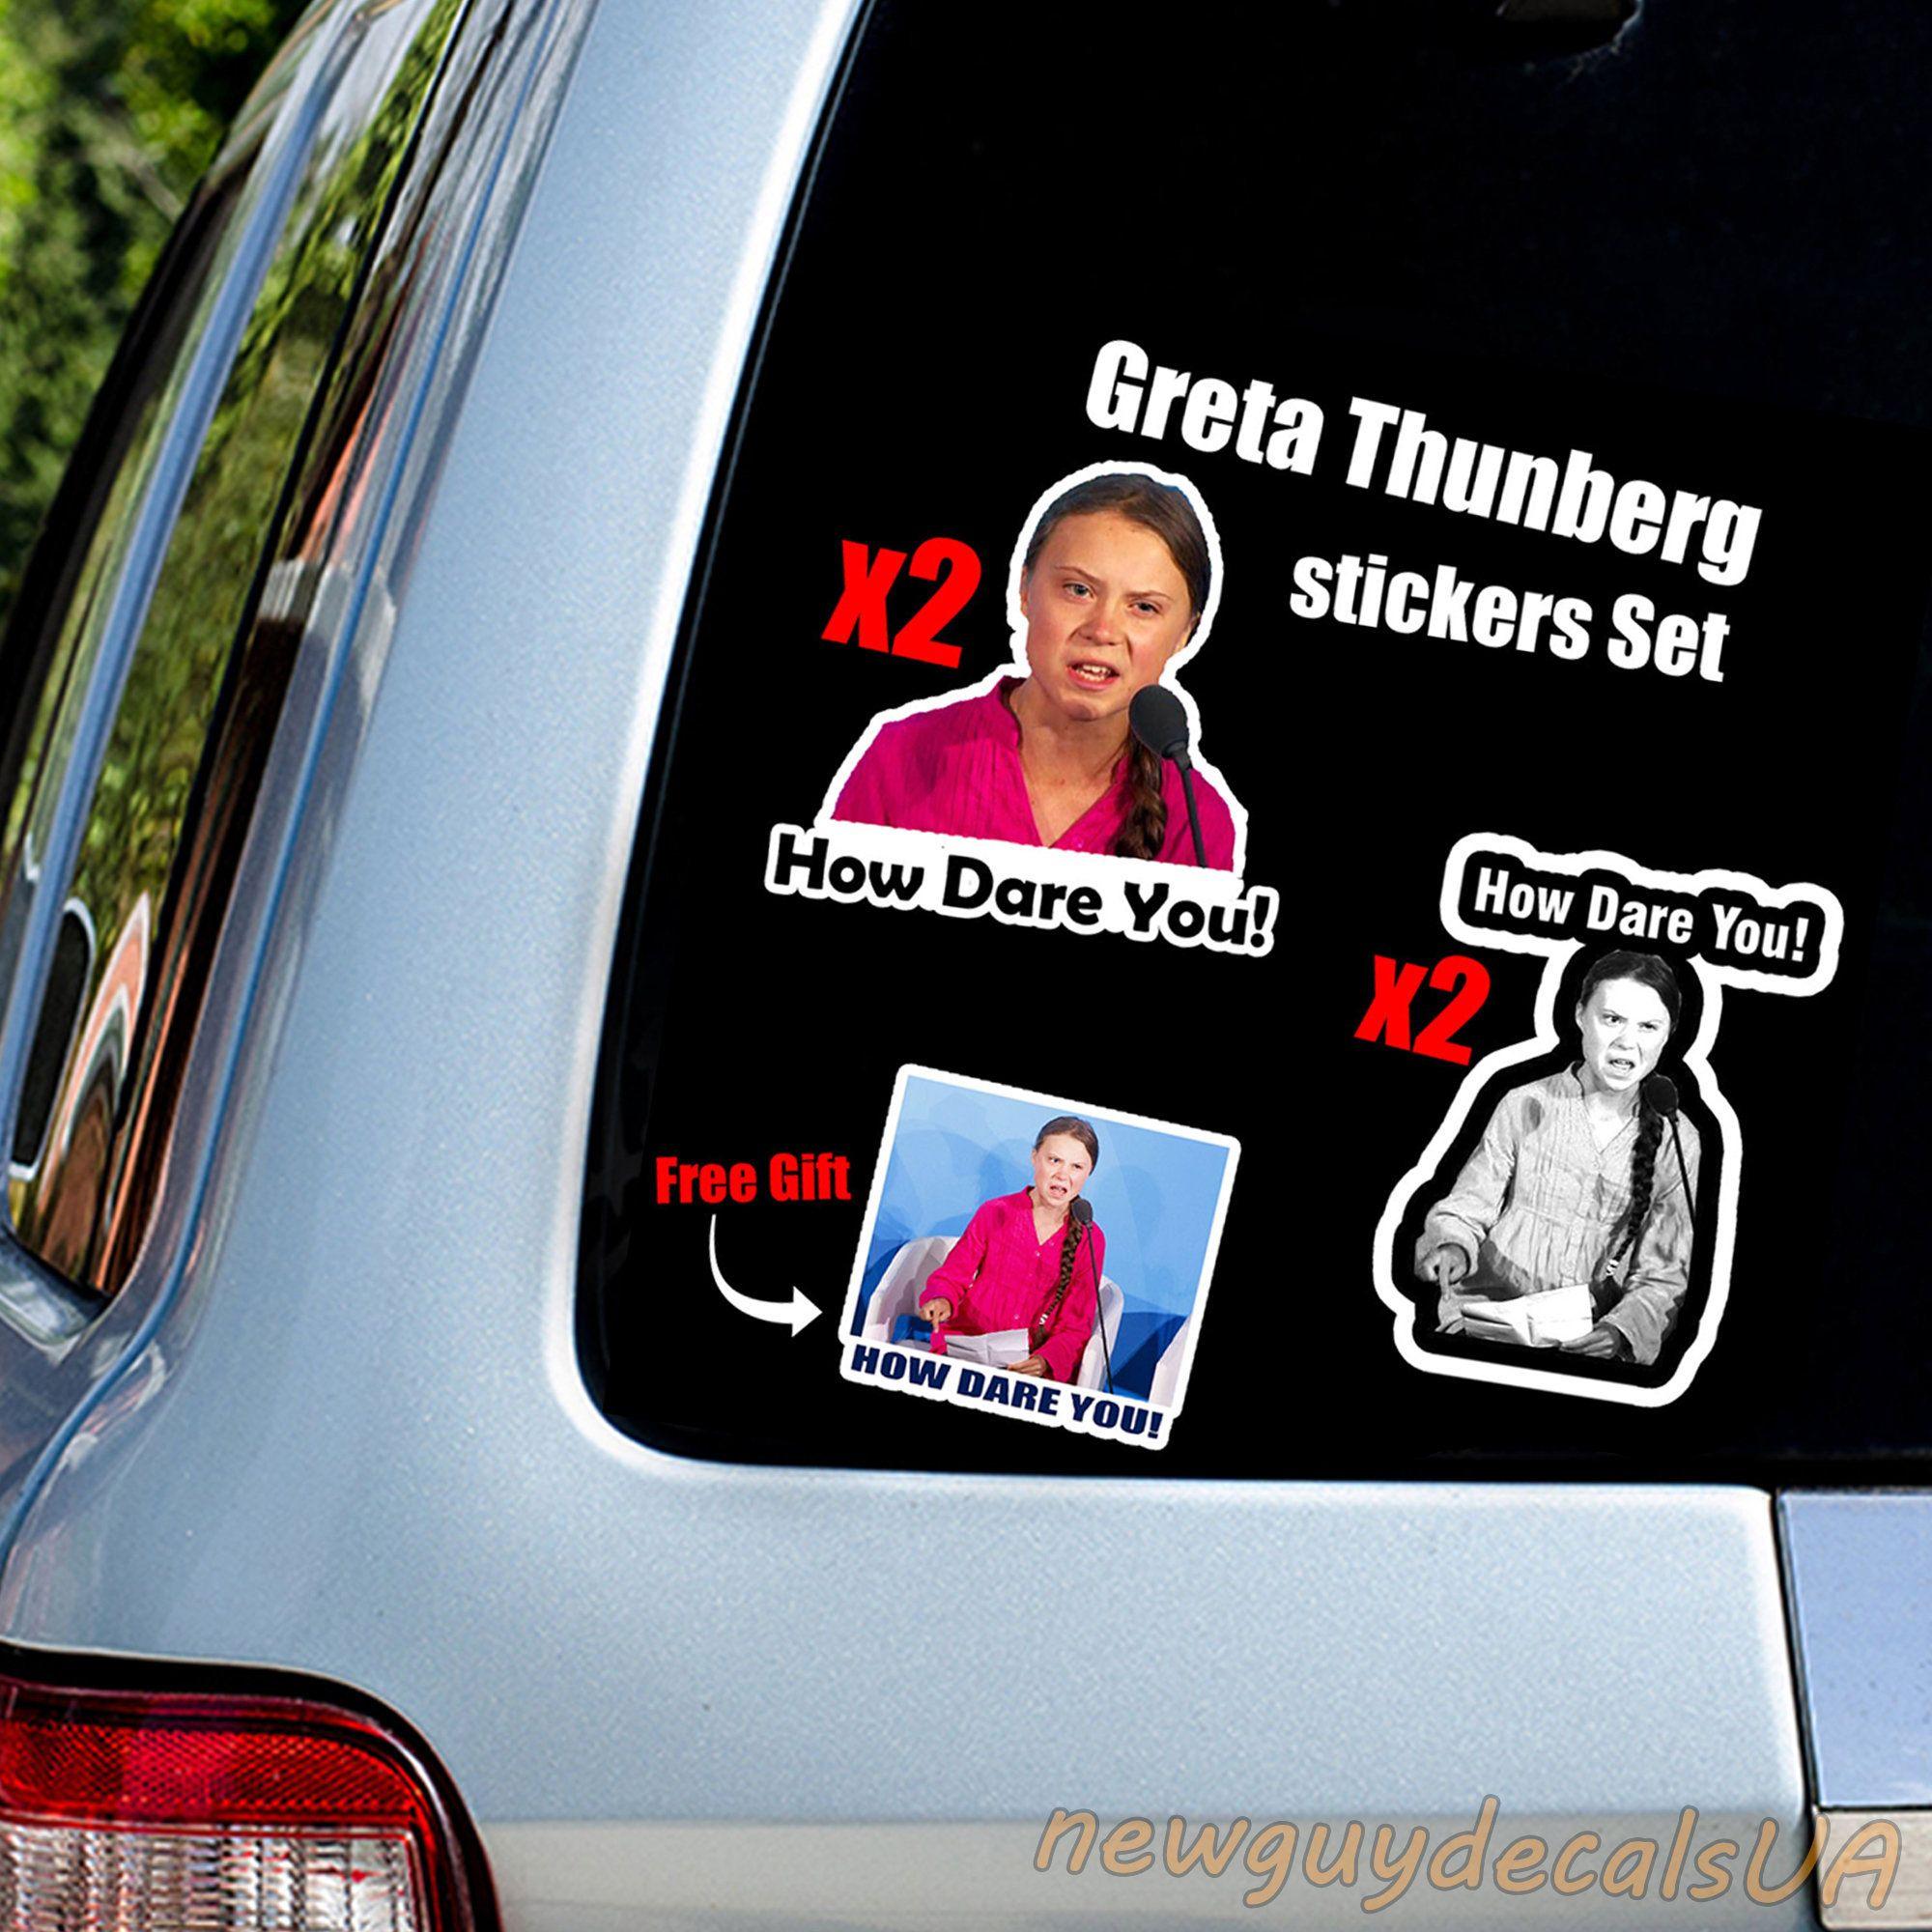 Set Of How Dare You Meme Greta Thunberg Car Sticker Decal Window Bumper Windshield Jdm Funny Vehicle Vinyl Car Stickers Car Stickers Car Window Stickers [ 2000 x 2000 Pixel ]